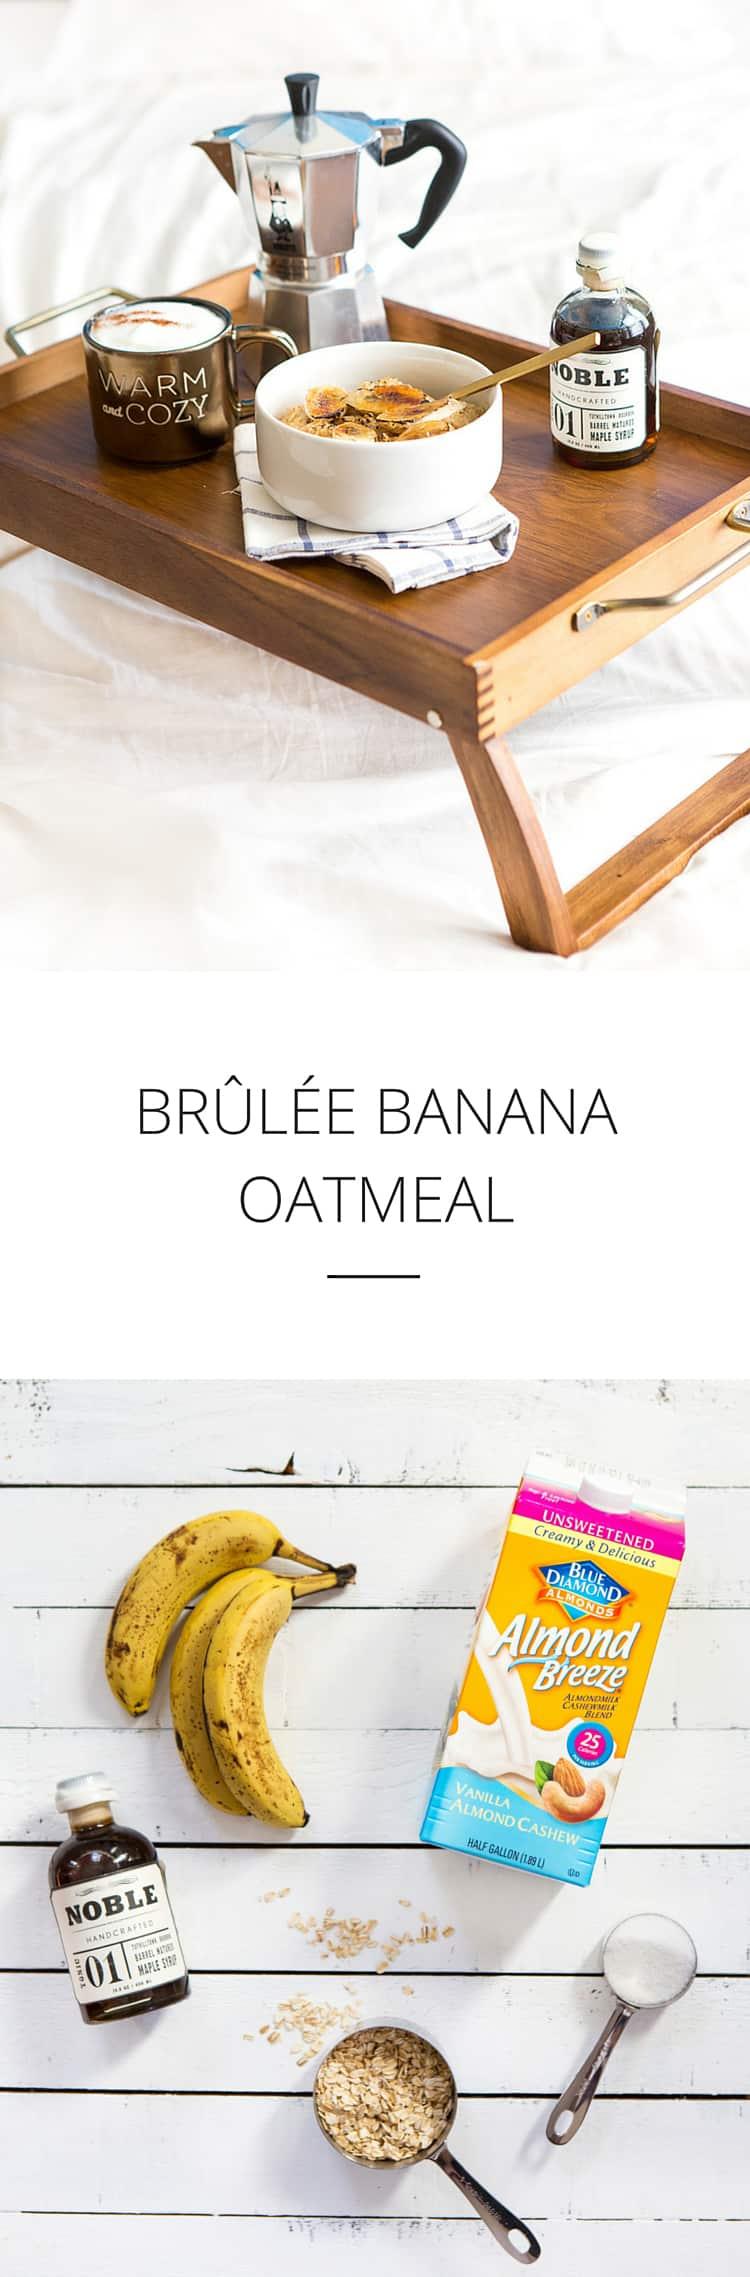 Brûlée Banana Oatmeal